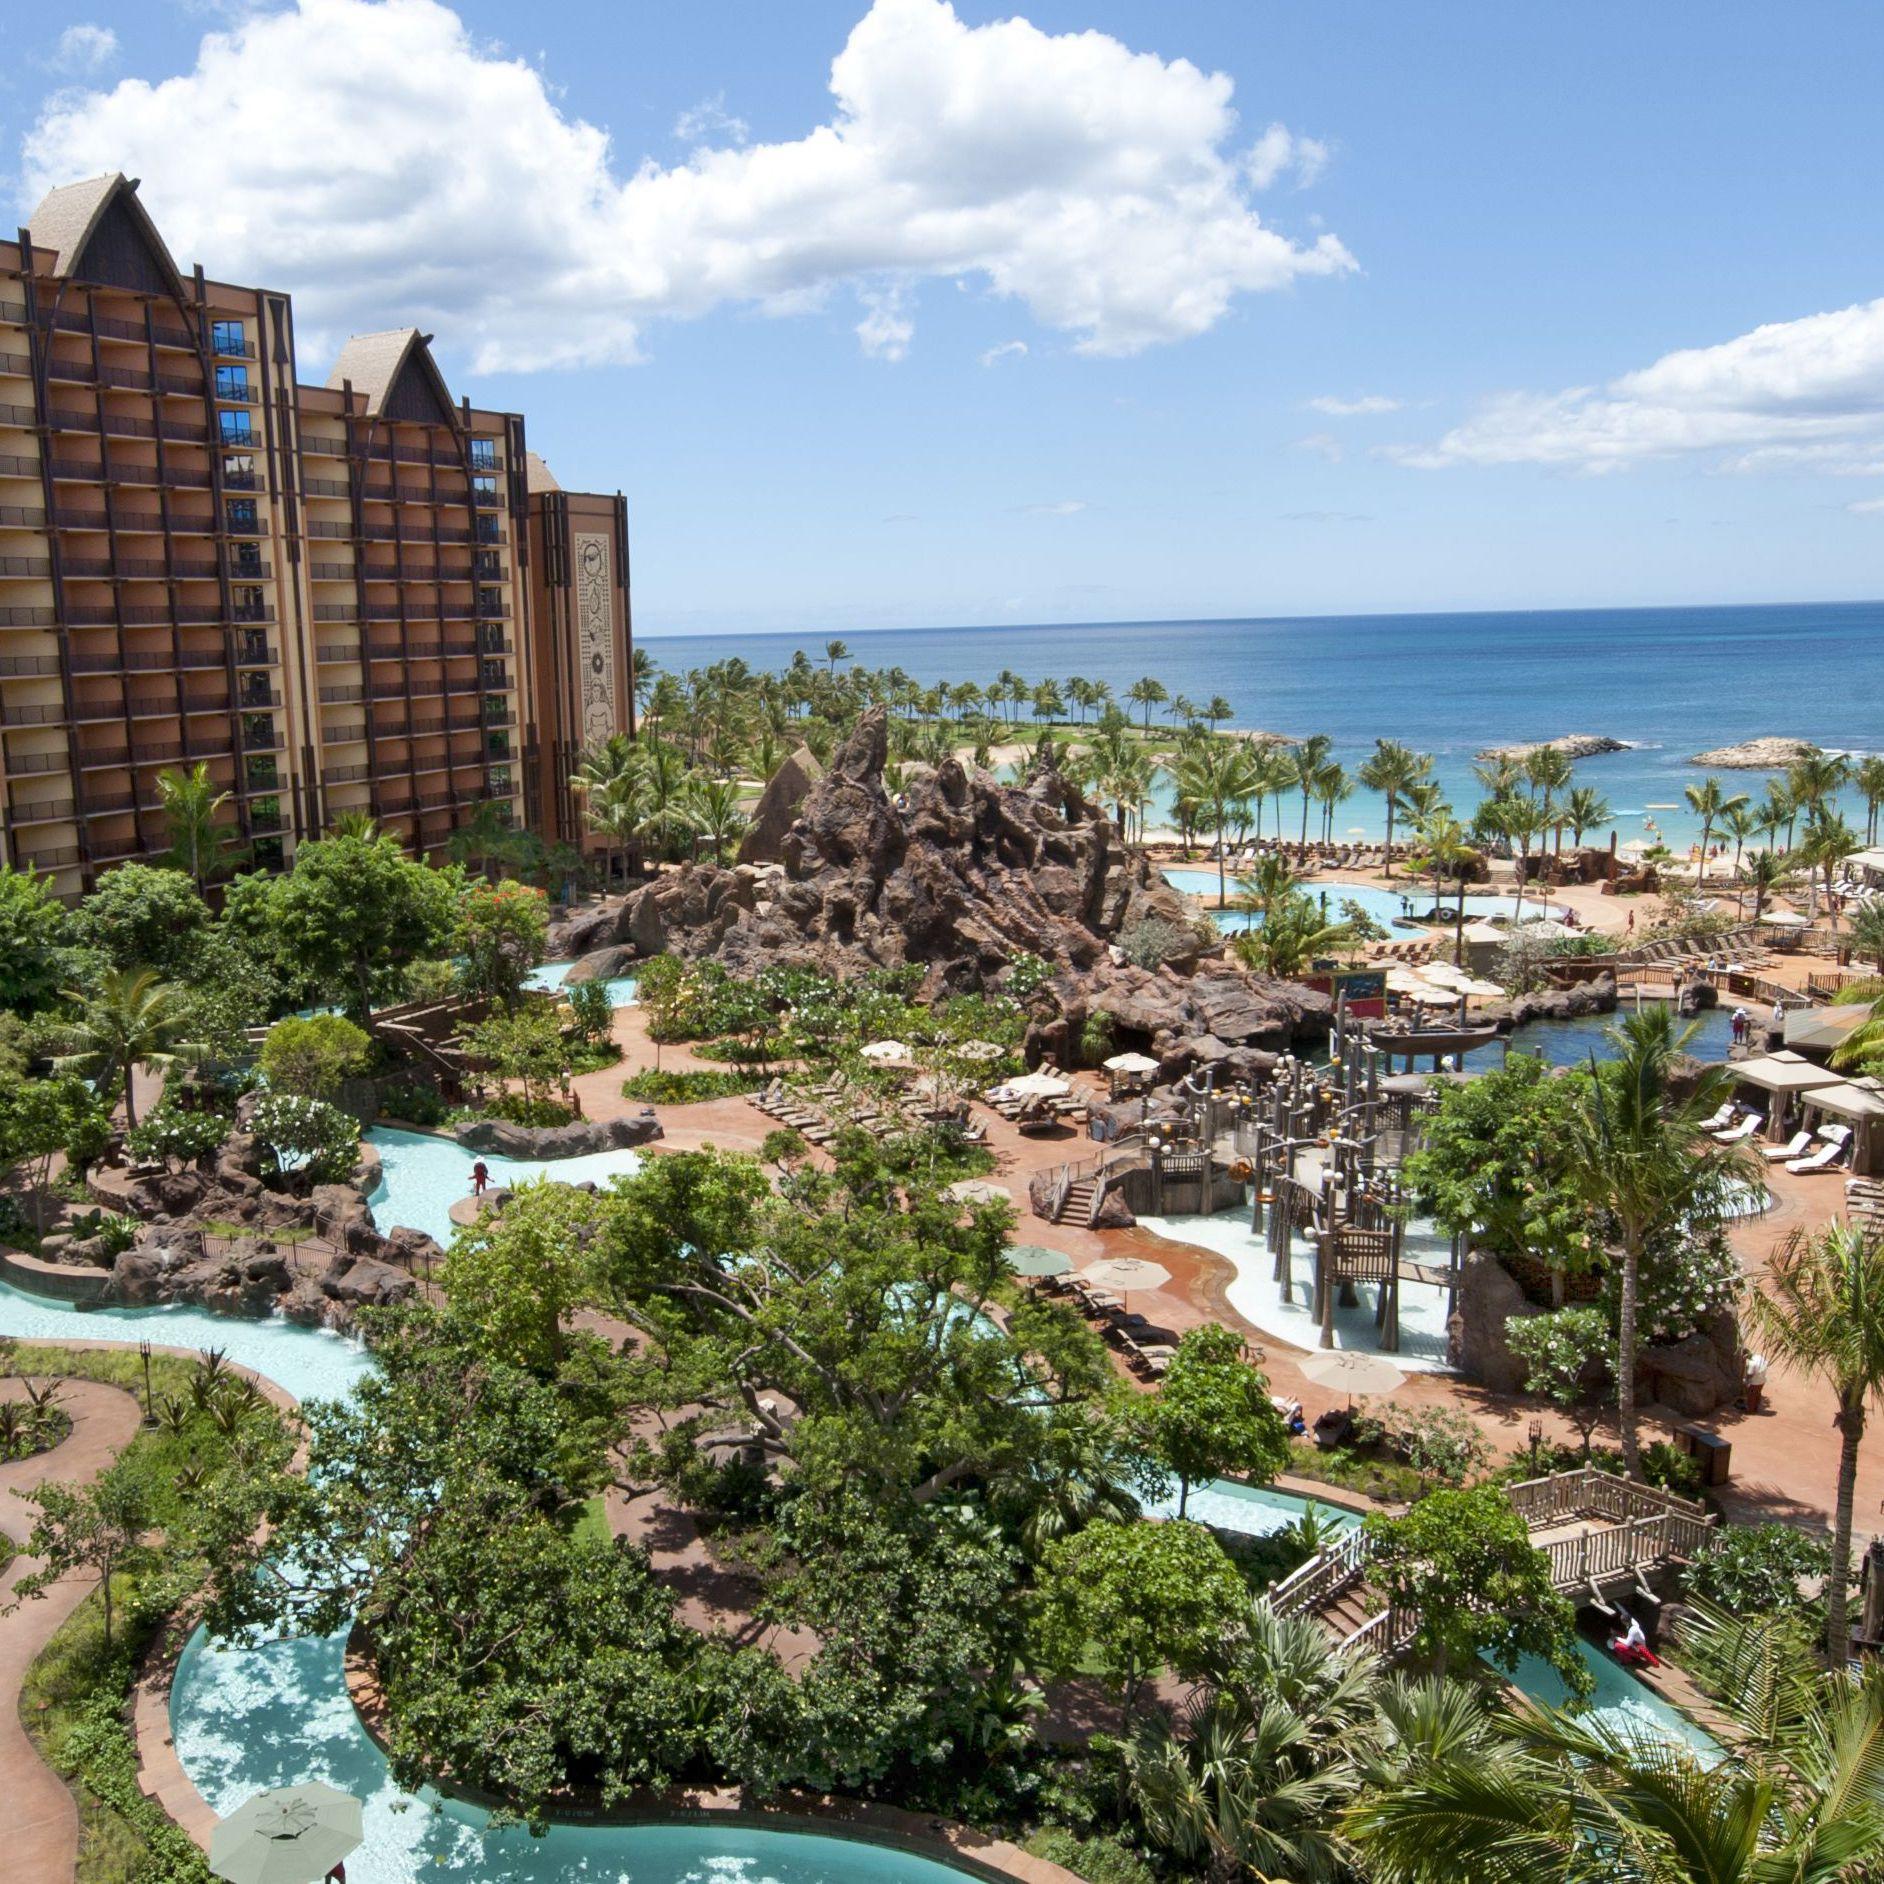 14 Reasons Why You Have to Visit Disney's Aulani Hawaii Resort